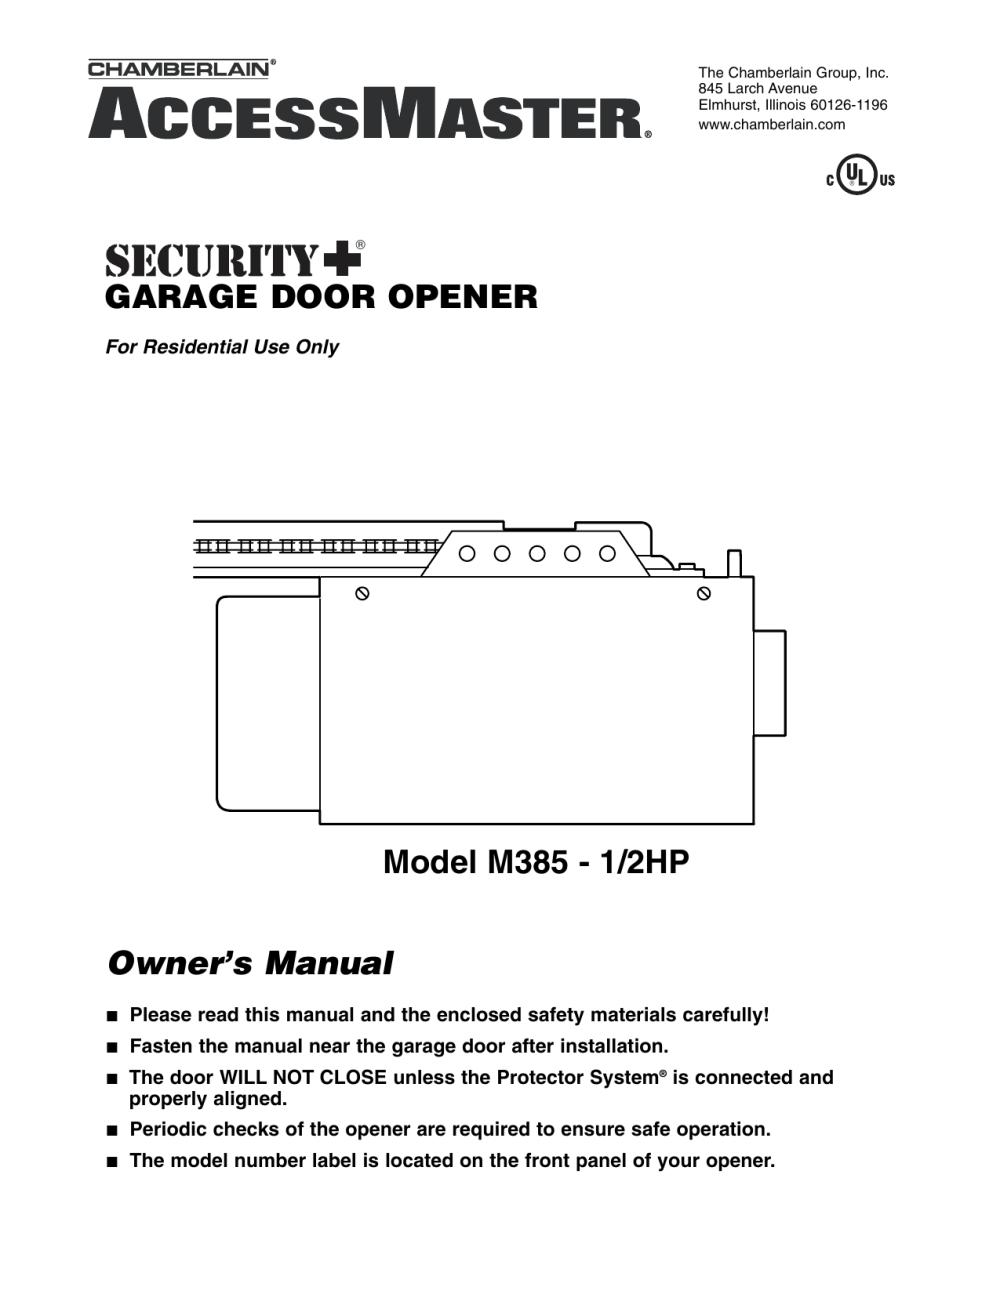 medium resolution of chamberlain m385 user s manual